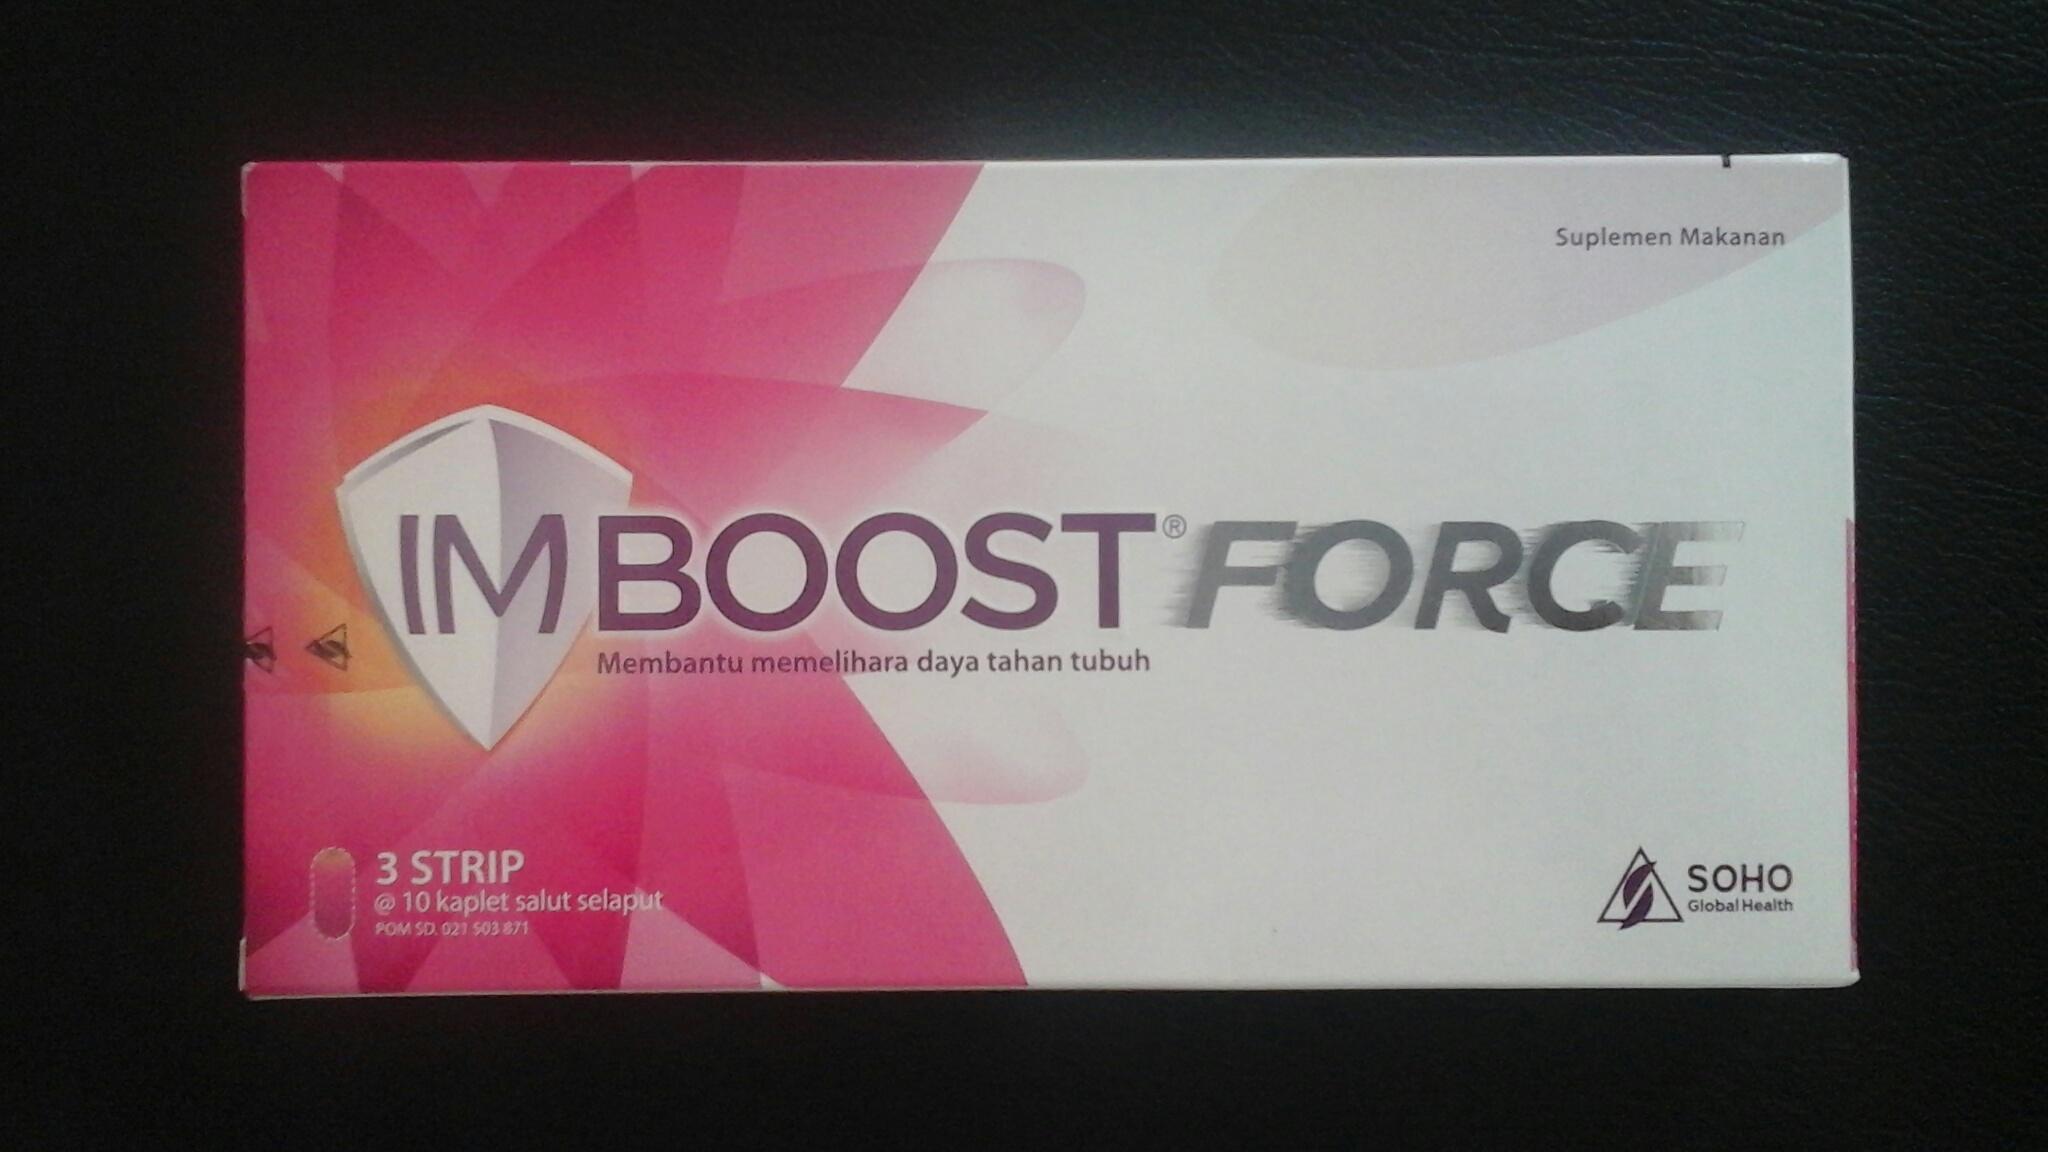 Obat Imboost Force | Suplemen Makanan